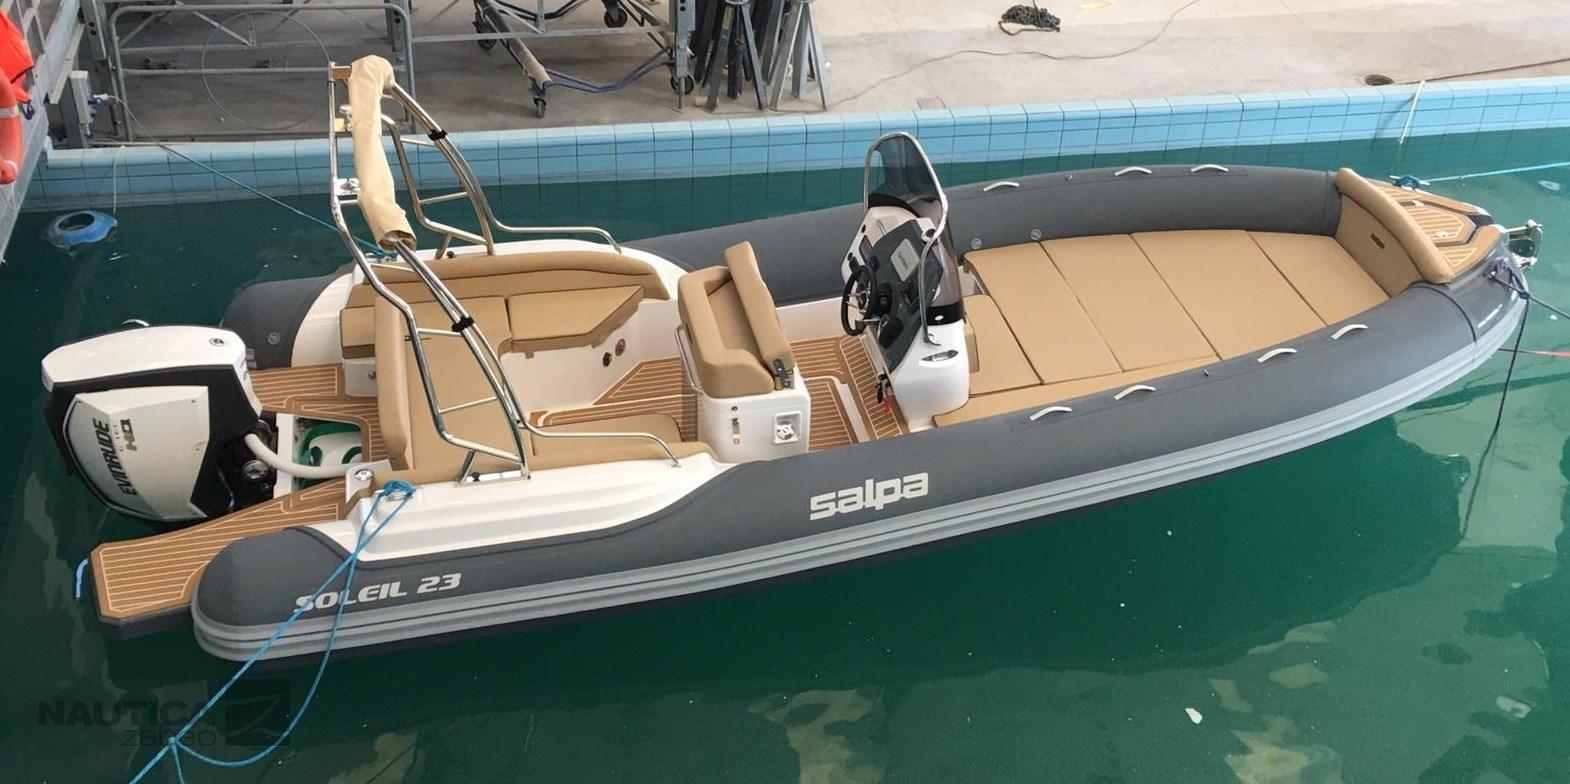 Salpa Soleil 23